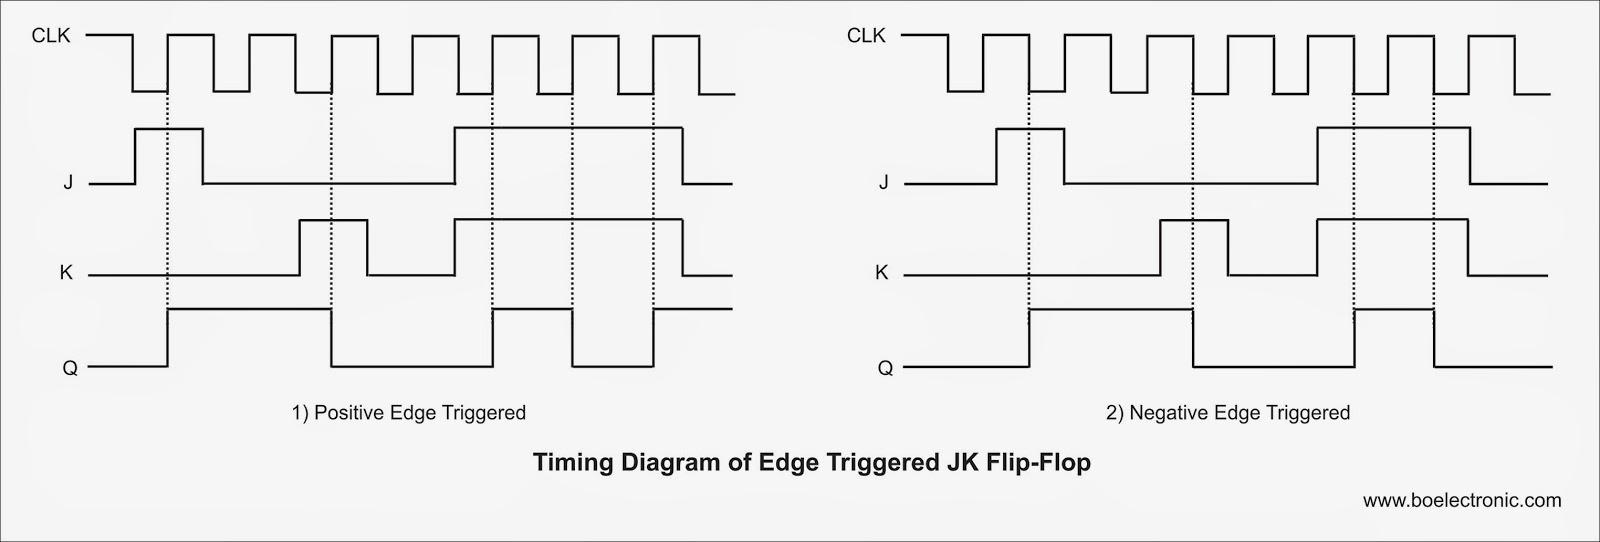 positive edge triggered d flip flop timing diagram d type flip flop elsavadorla negative edge triggered [ 1600 x 542 Pixel ]